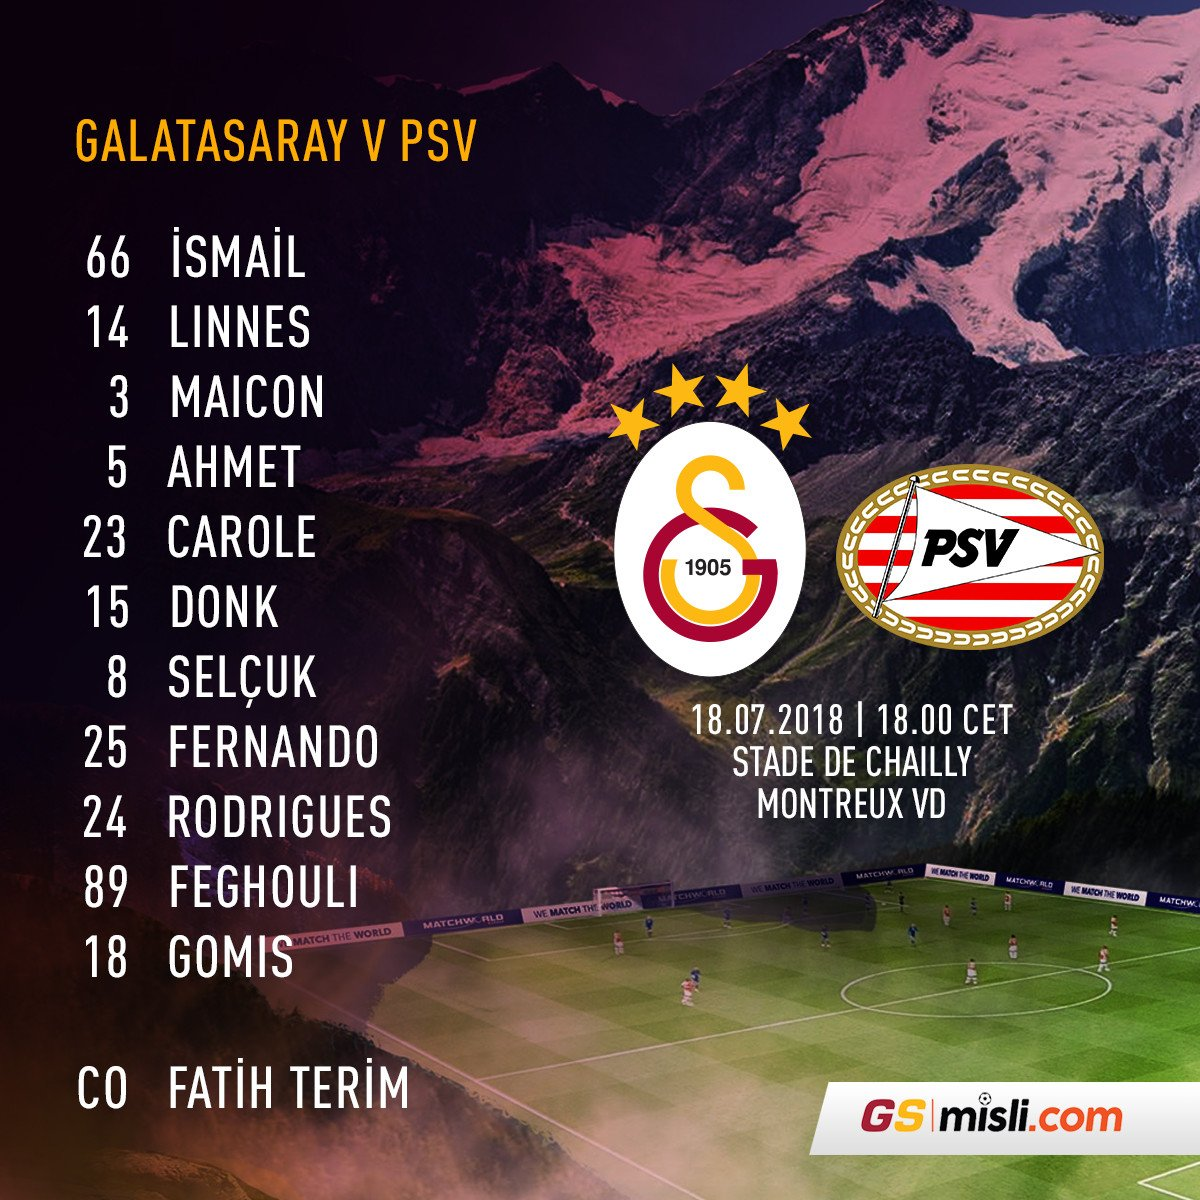 🦁 Here's the tonight's lineup vs @PSV: #WeAreGalatasaray